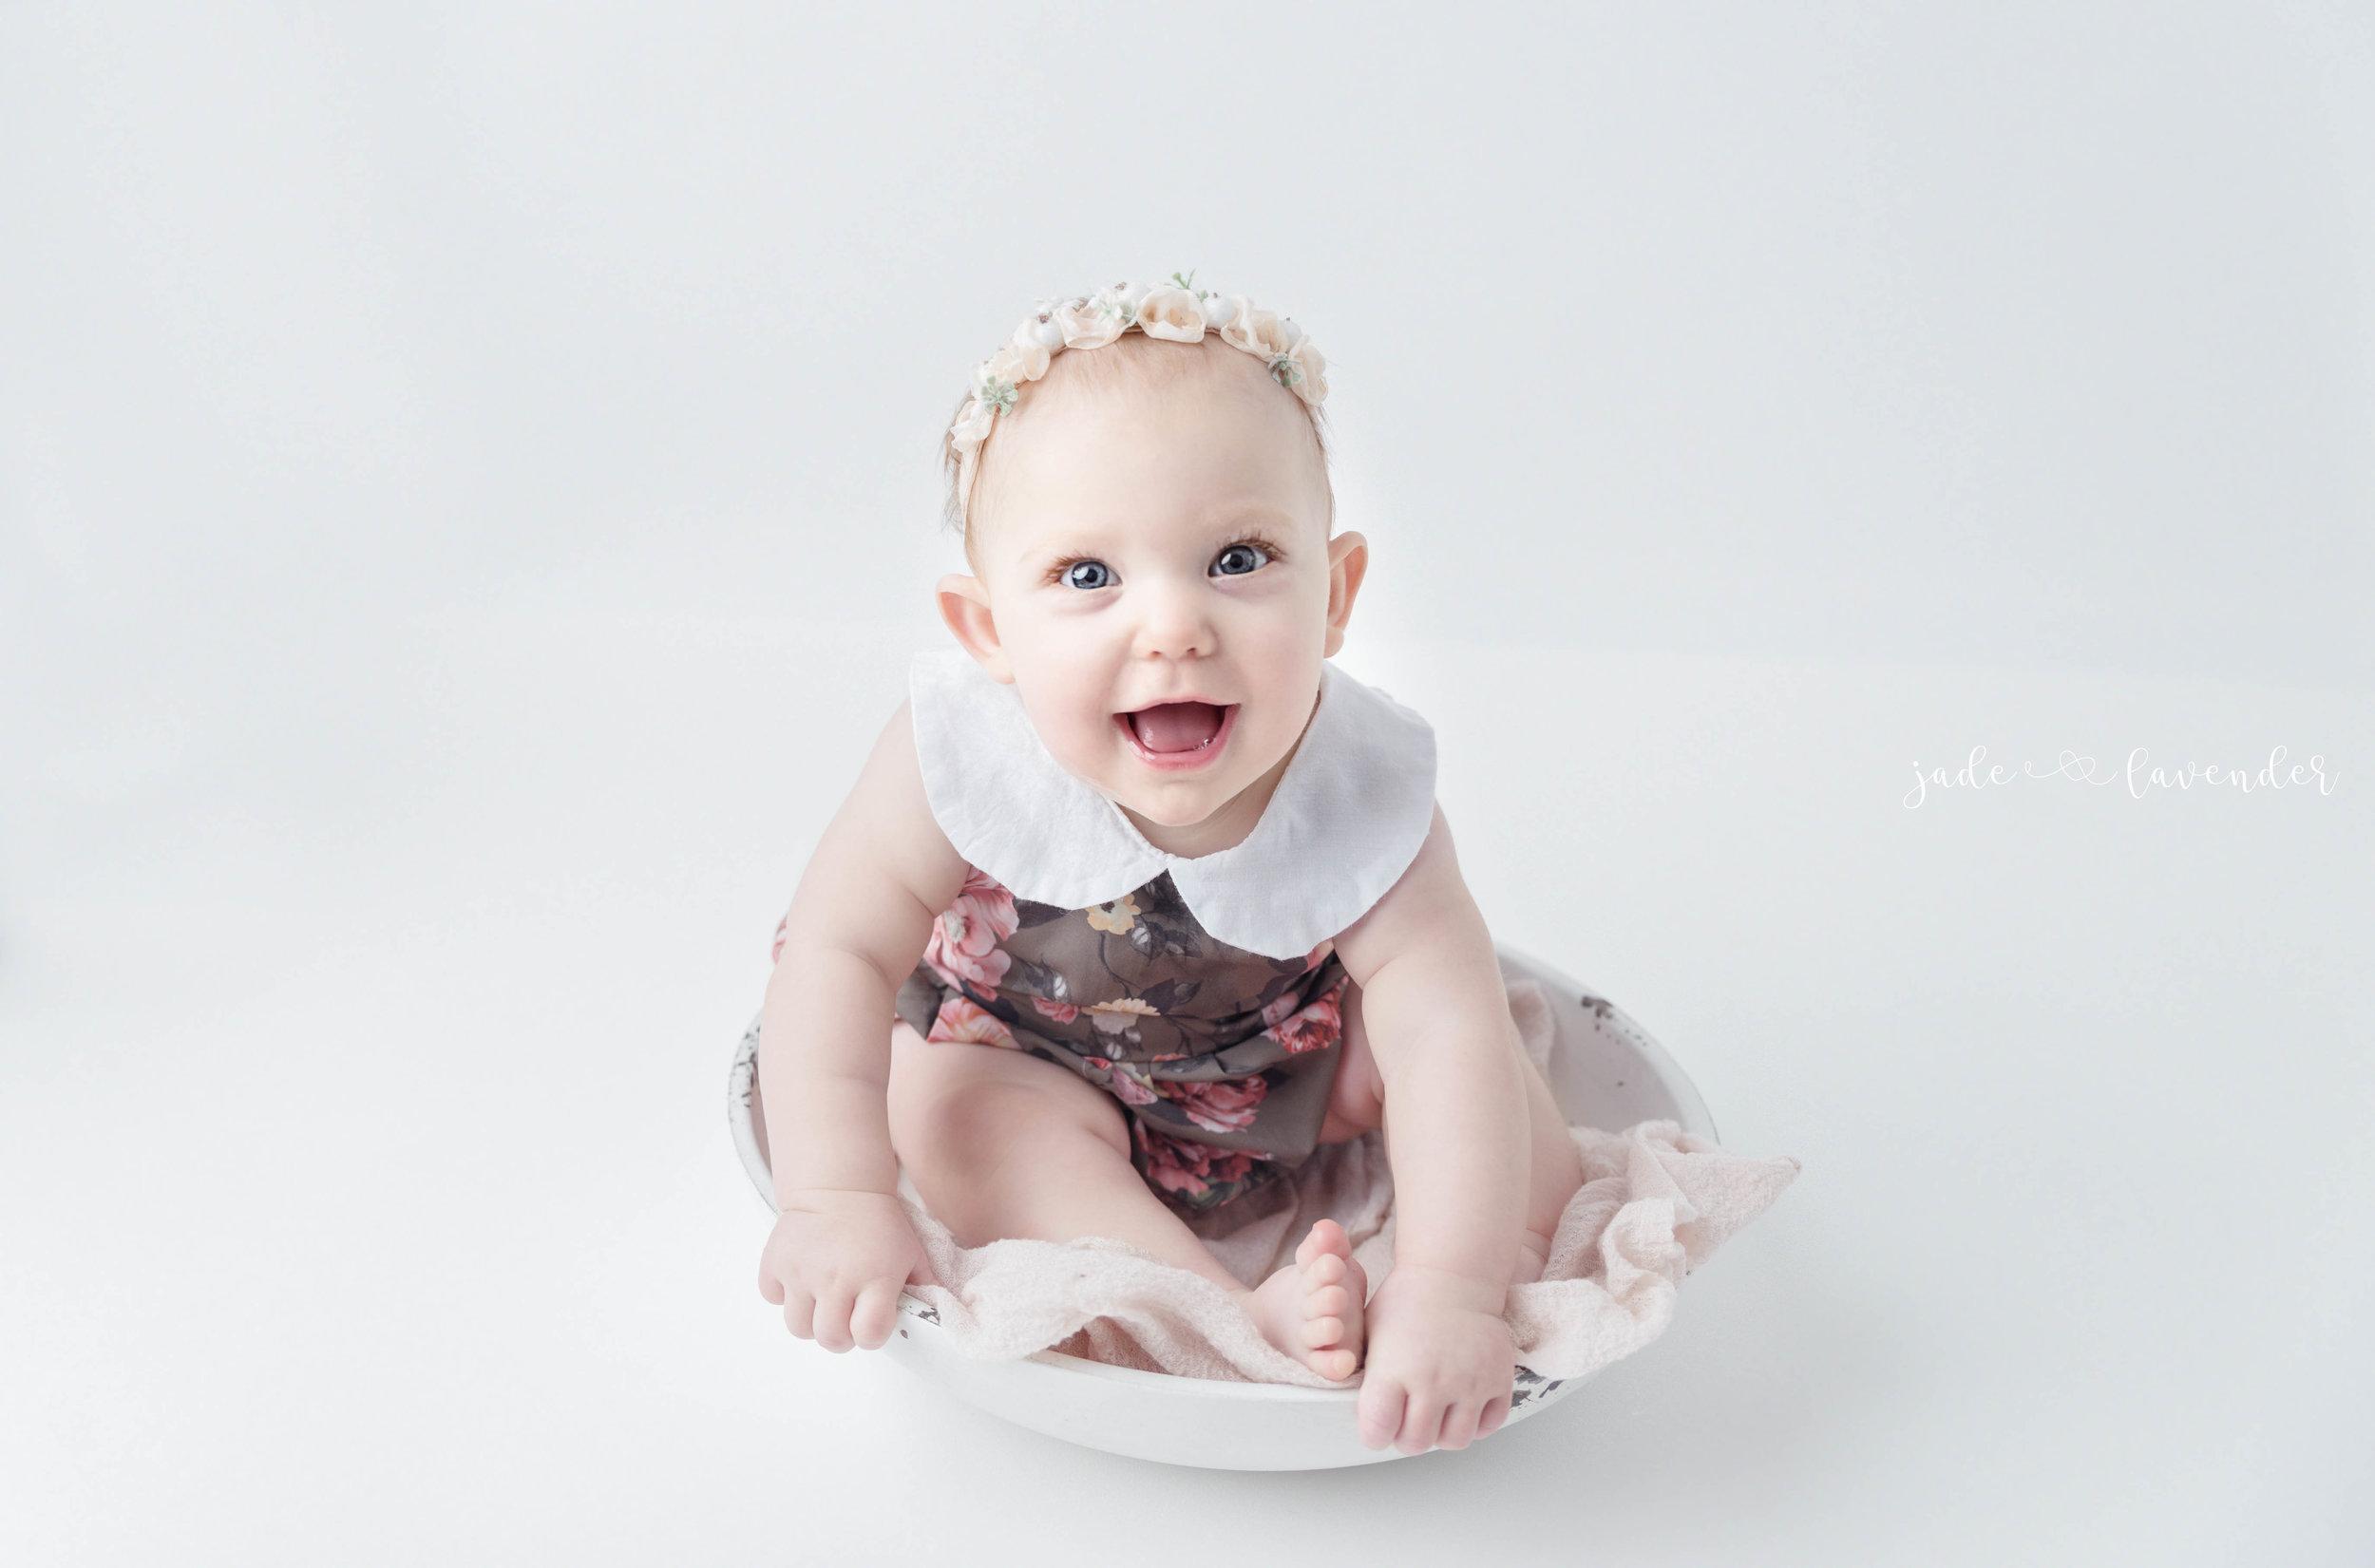 baby-milk-bath-photography-infant-images-milestone-photos-spokane-washington.jpg